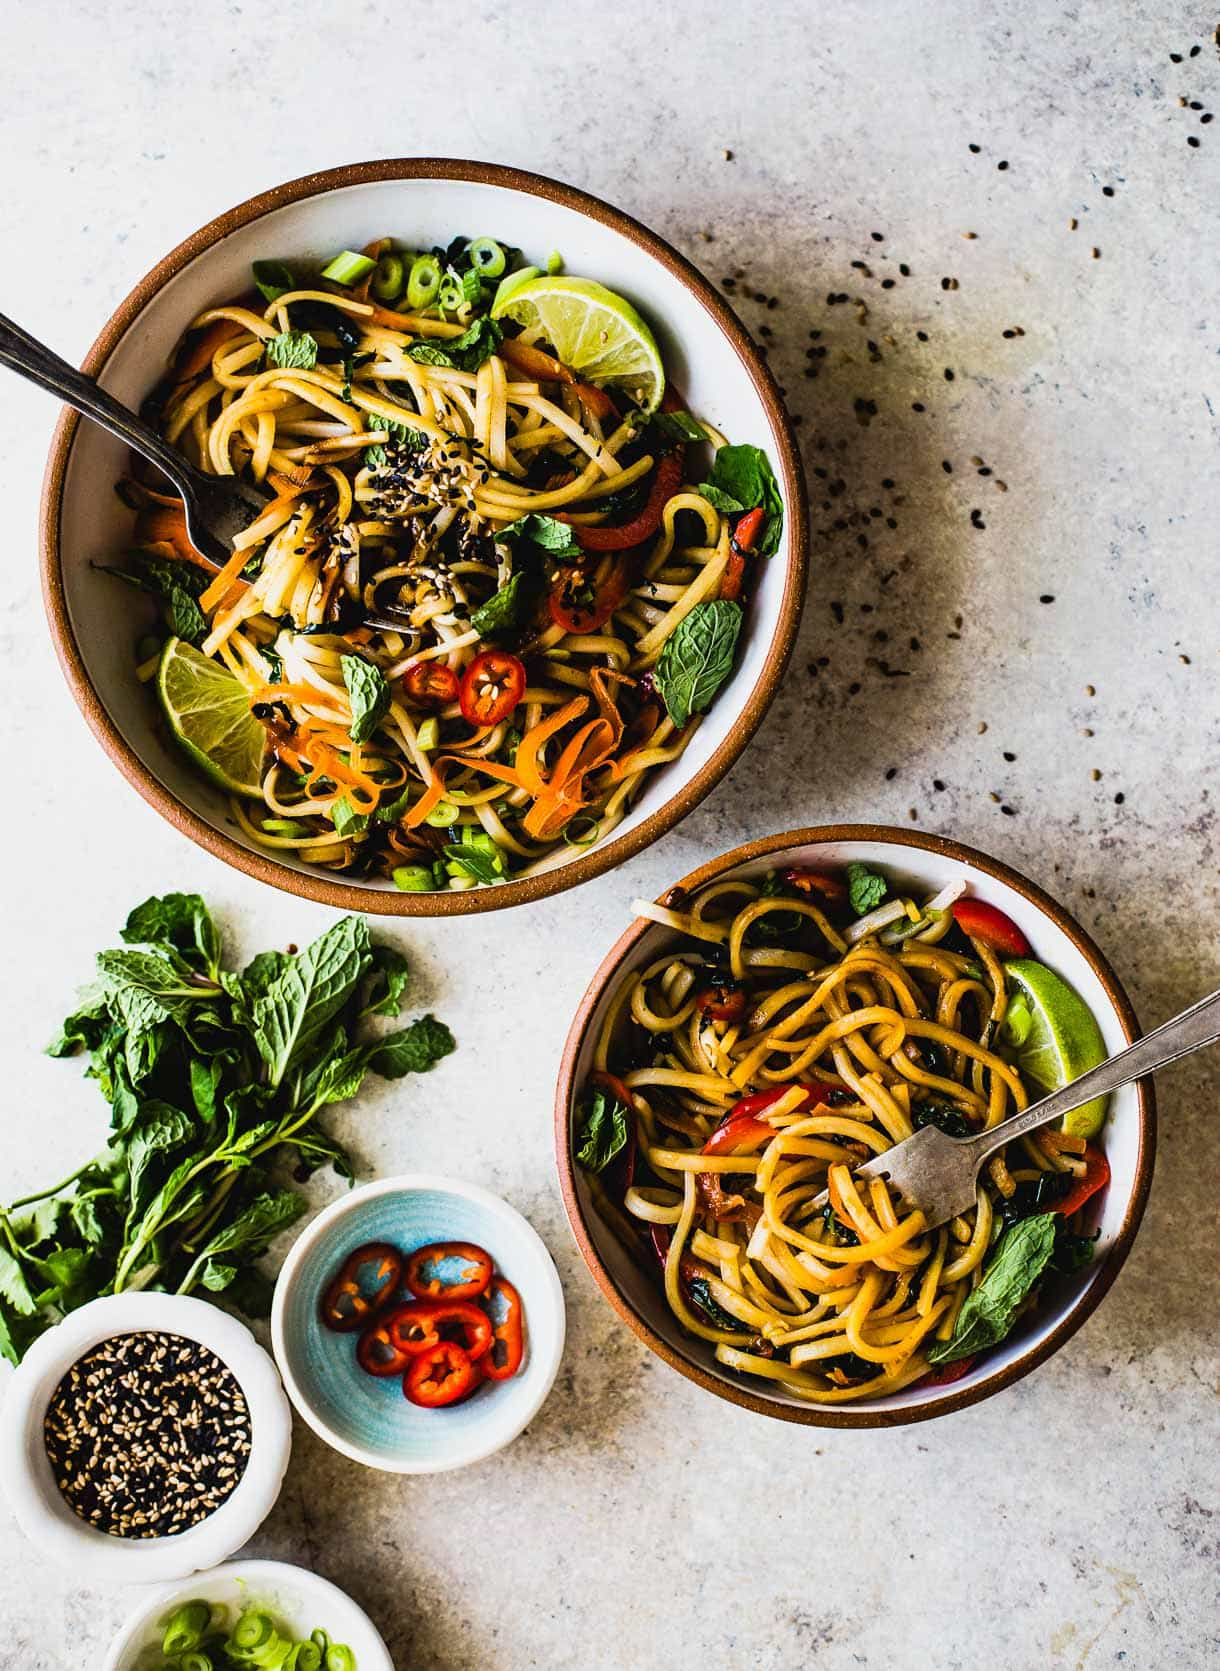 Sesame Thai Rice Noodles With Vegetables Vegan Recipe